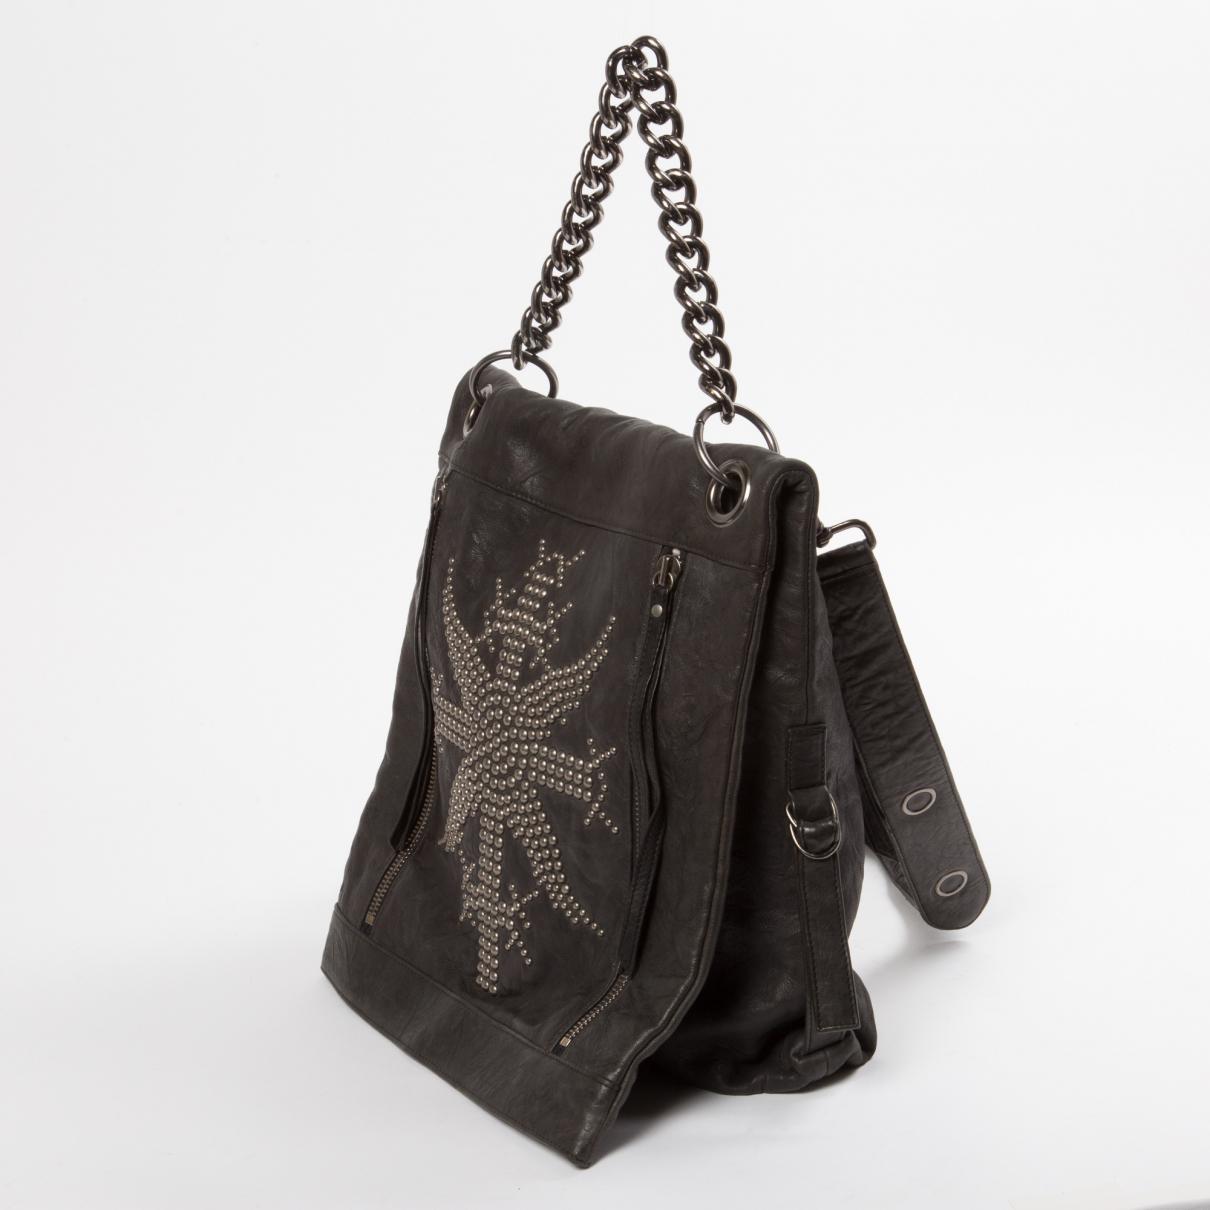 Chrome Hearts Pre-owned - Leather handbag K4009m